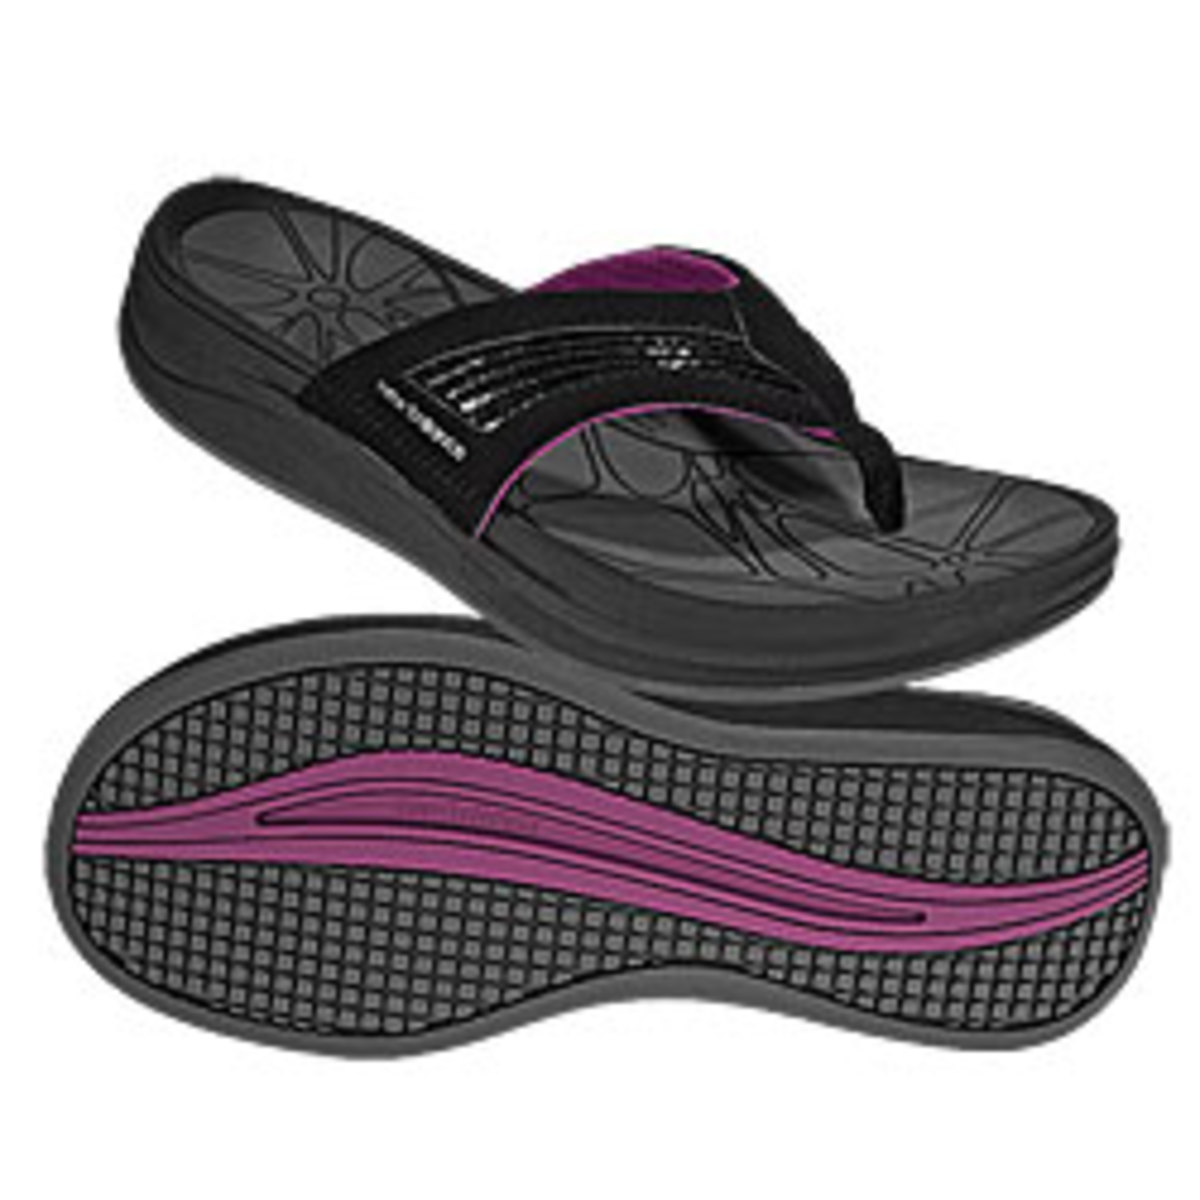 New Balance Rock&Tone Sandals